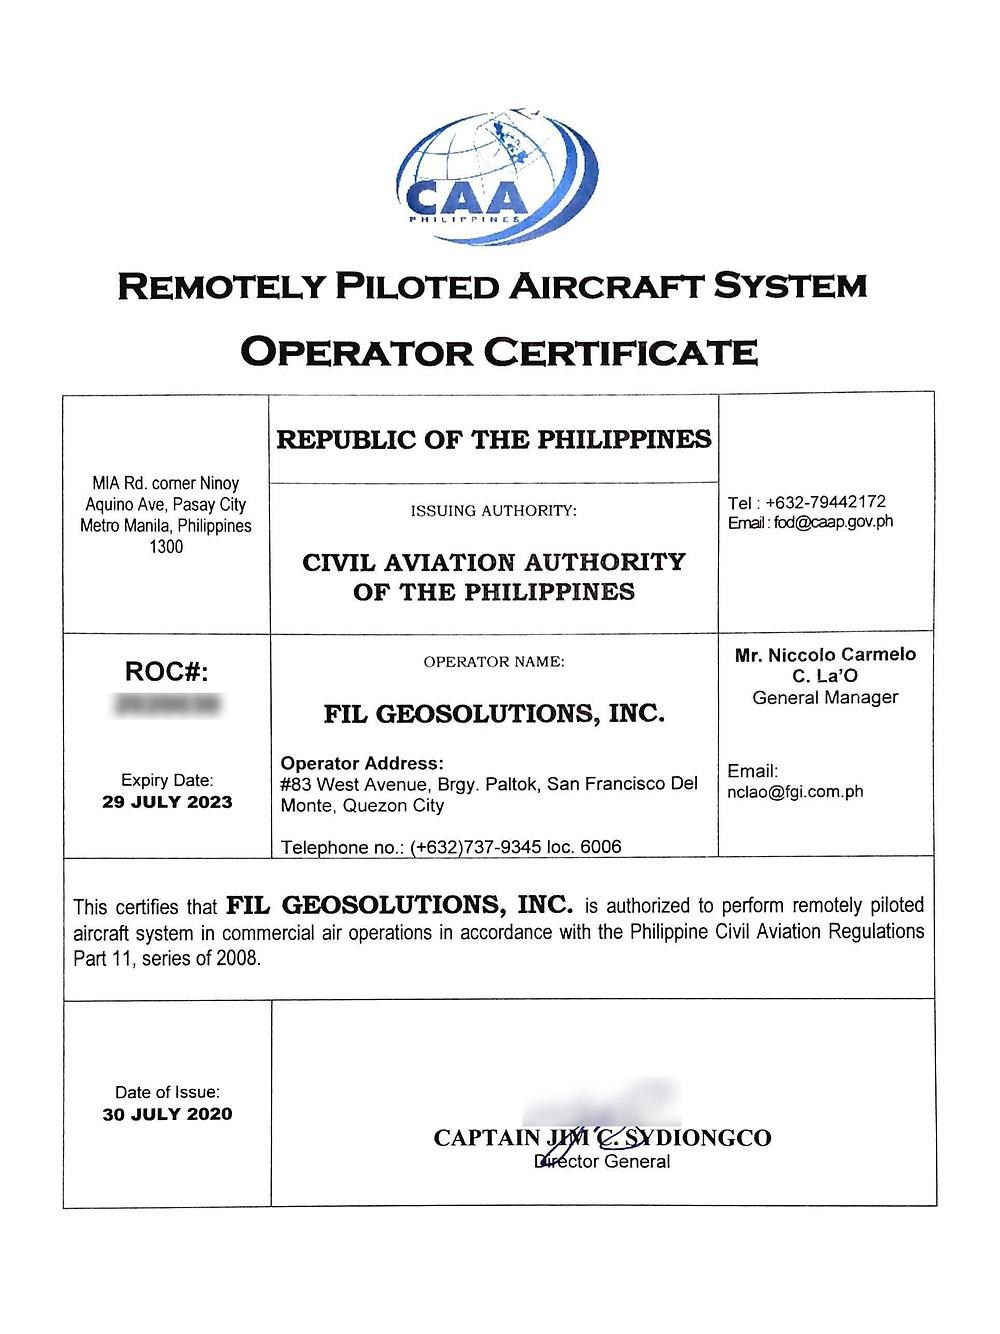 caap-operators-certificate